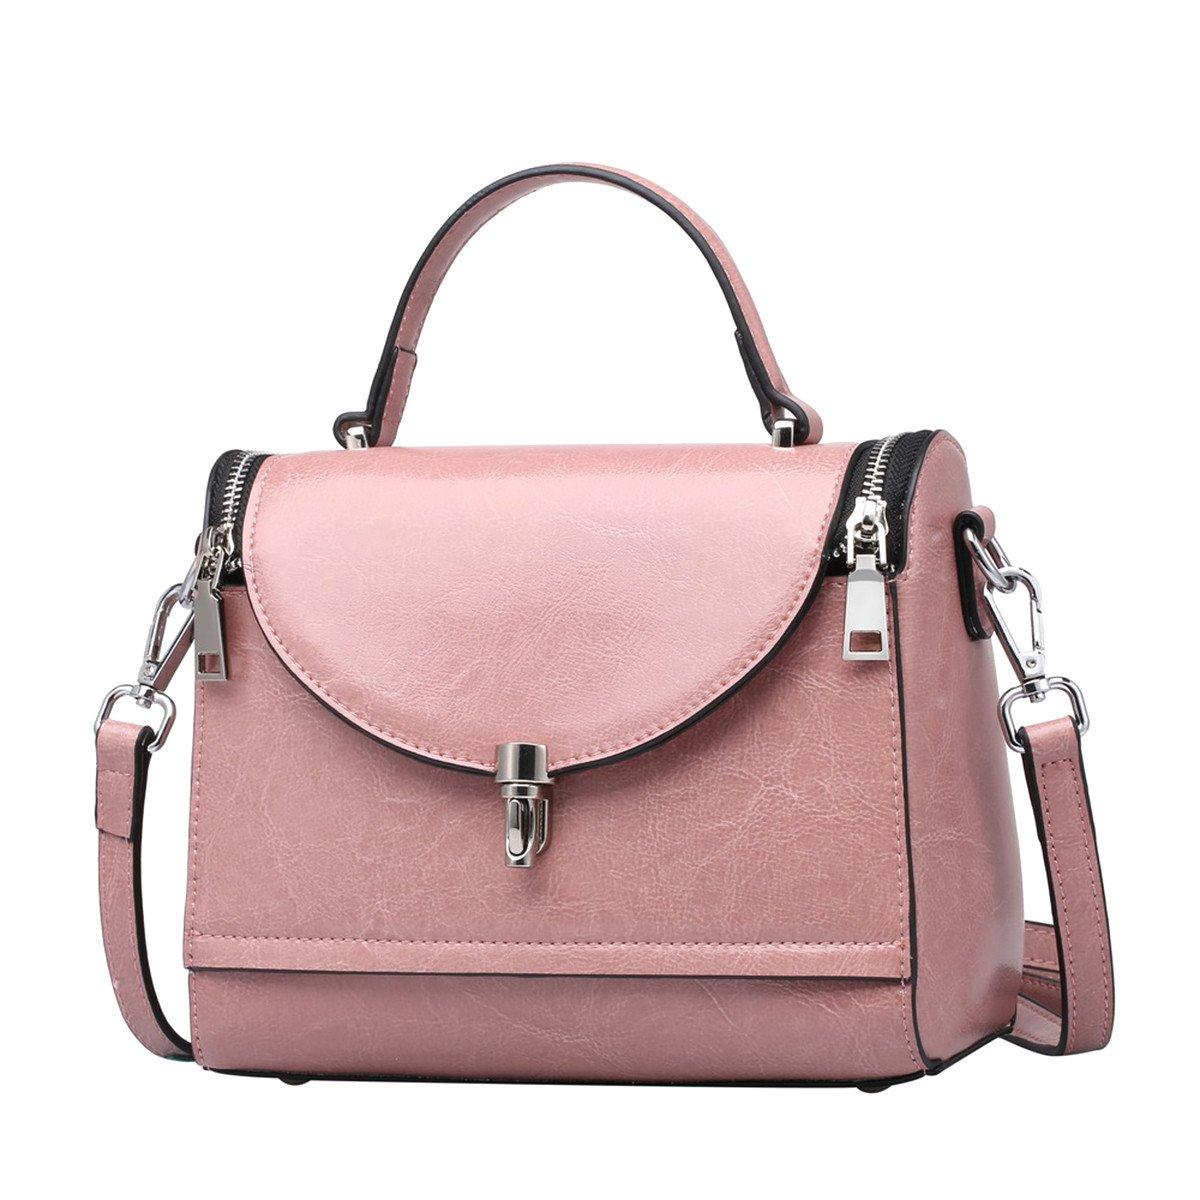 Double Zipper Leather Shoulder Bag Cross-body Satchel Casual Handbag for Women and Girls